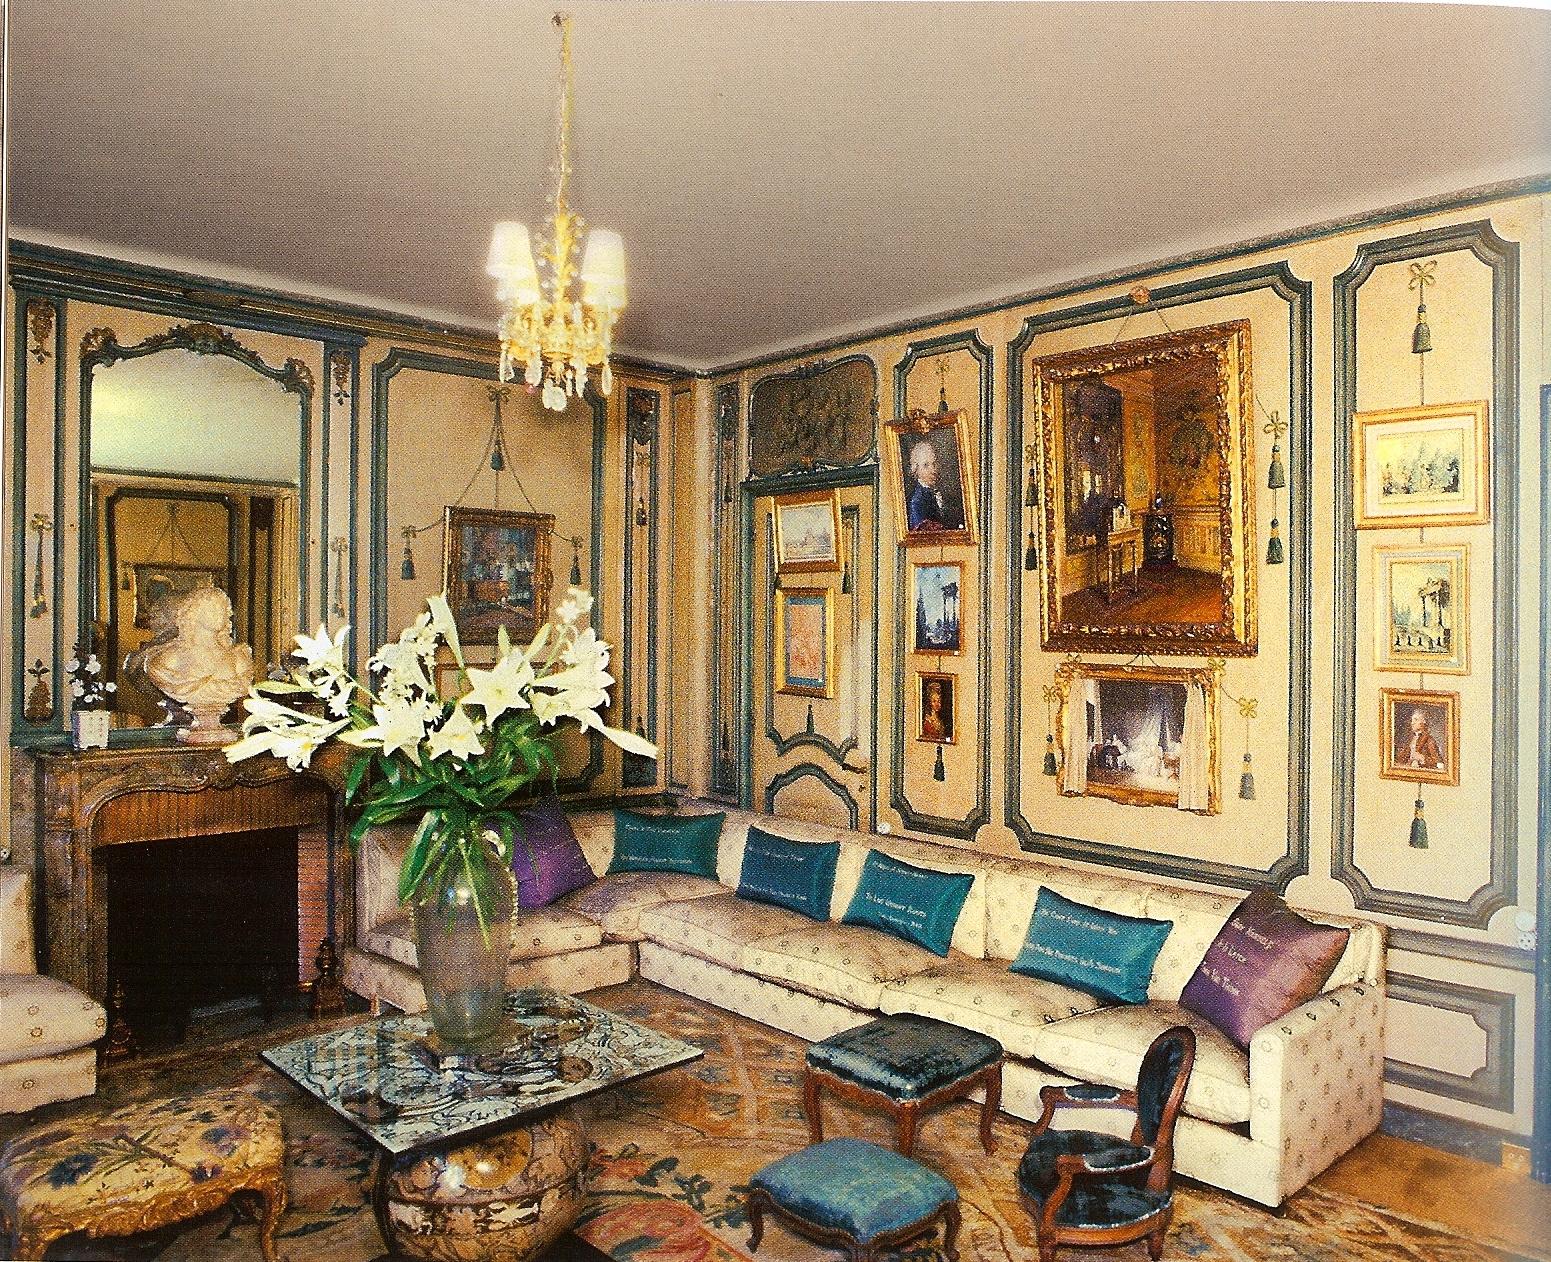 Women 39 s history month amy hirschamy hirsch for Ann wolf interior decoration